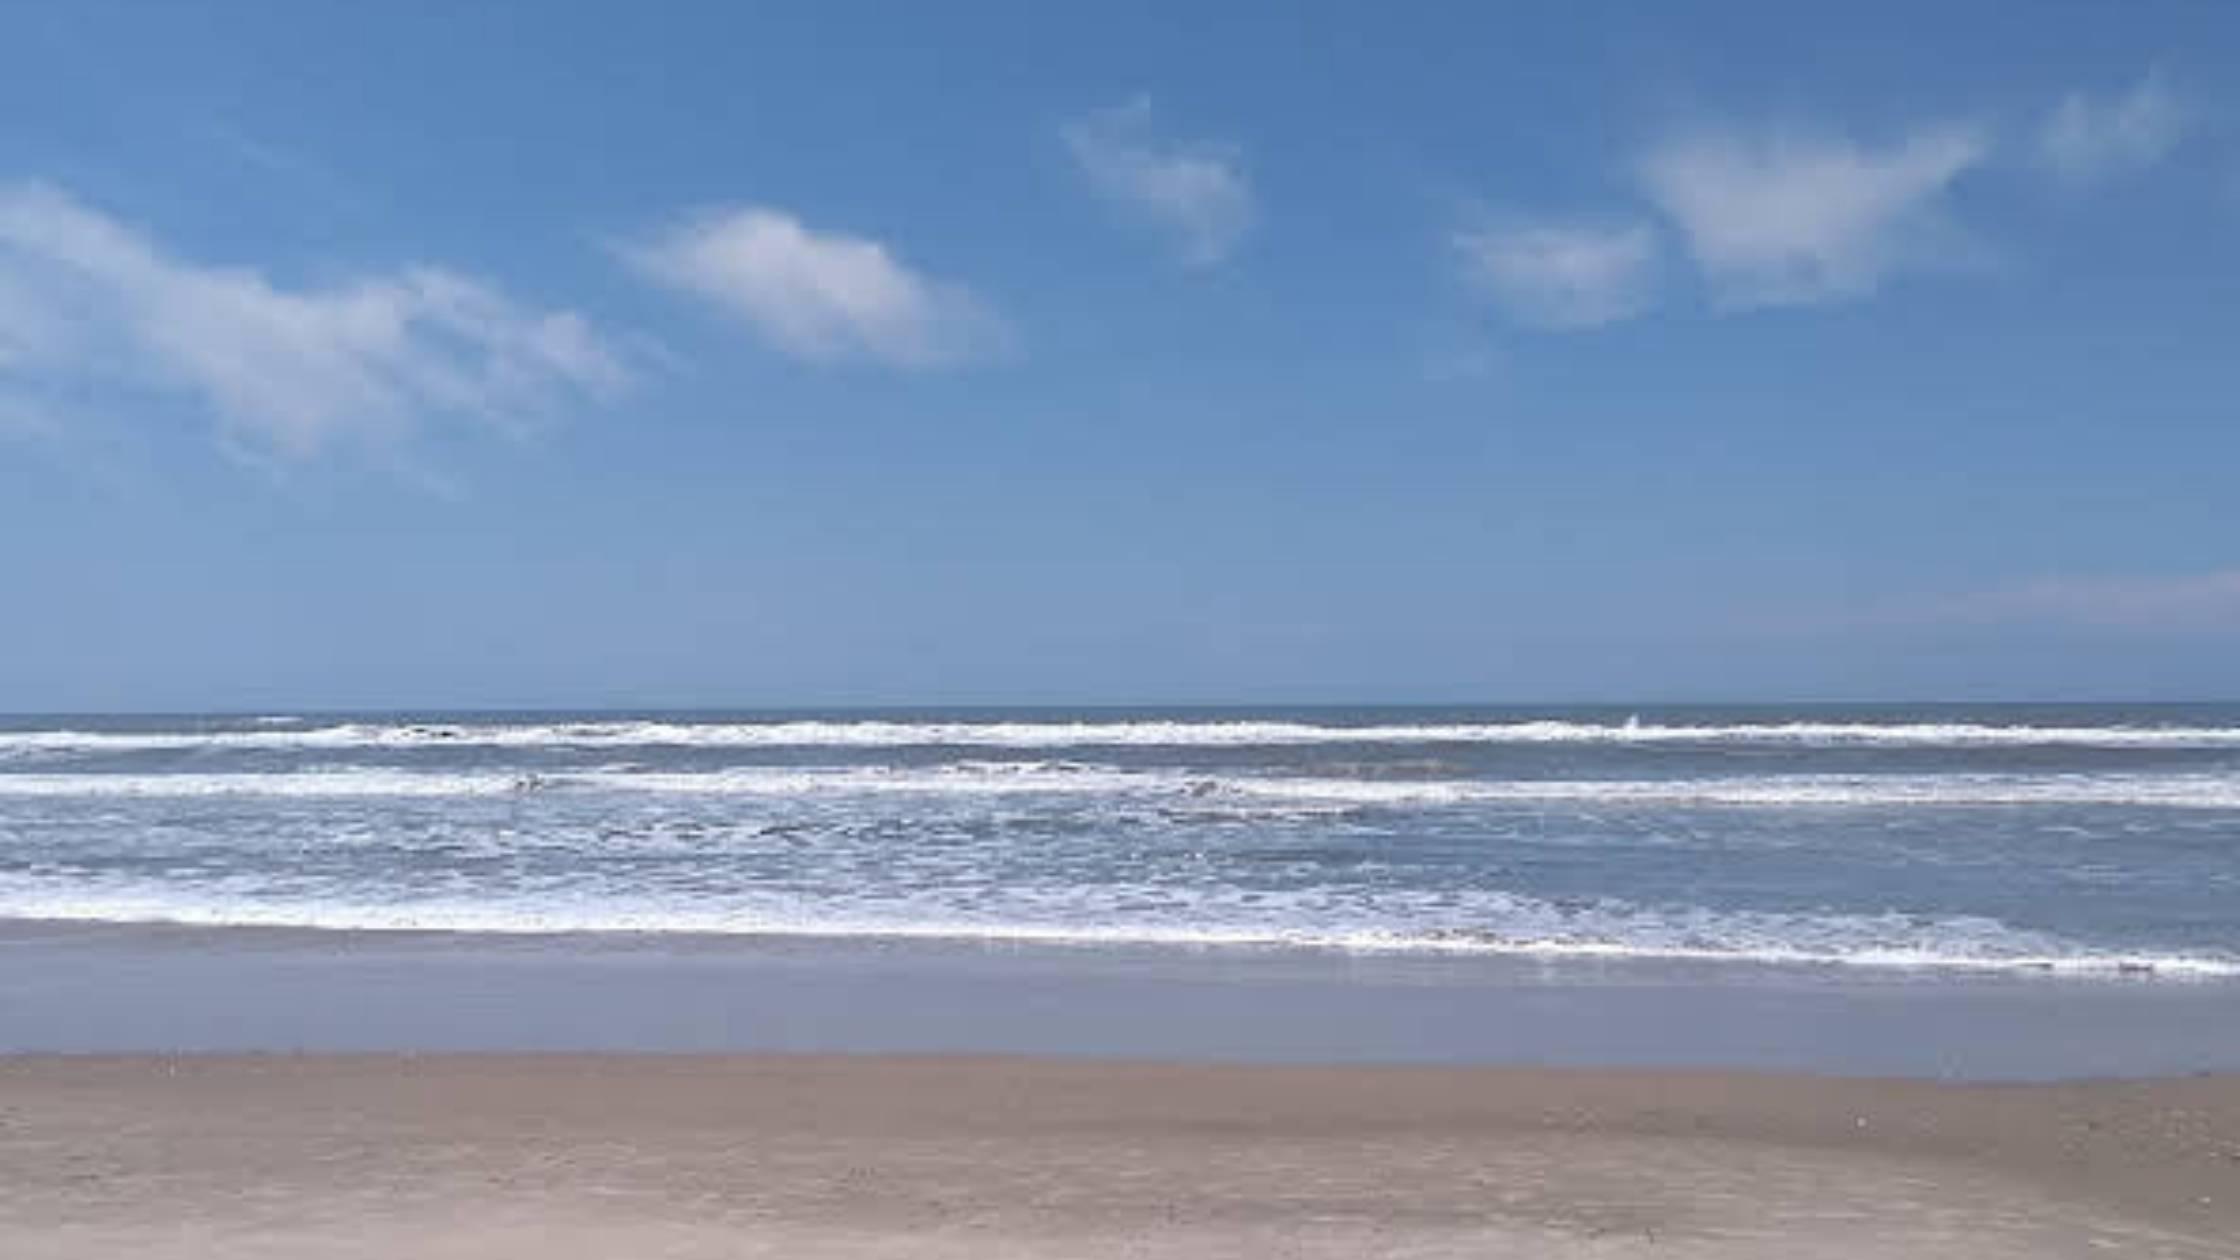 Praia rainha do mar